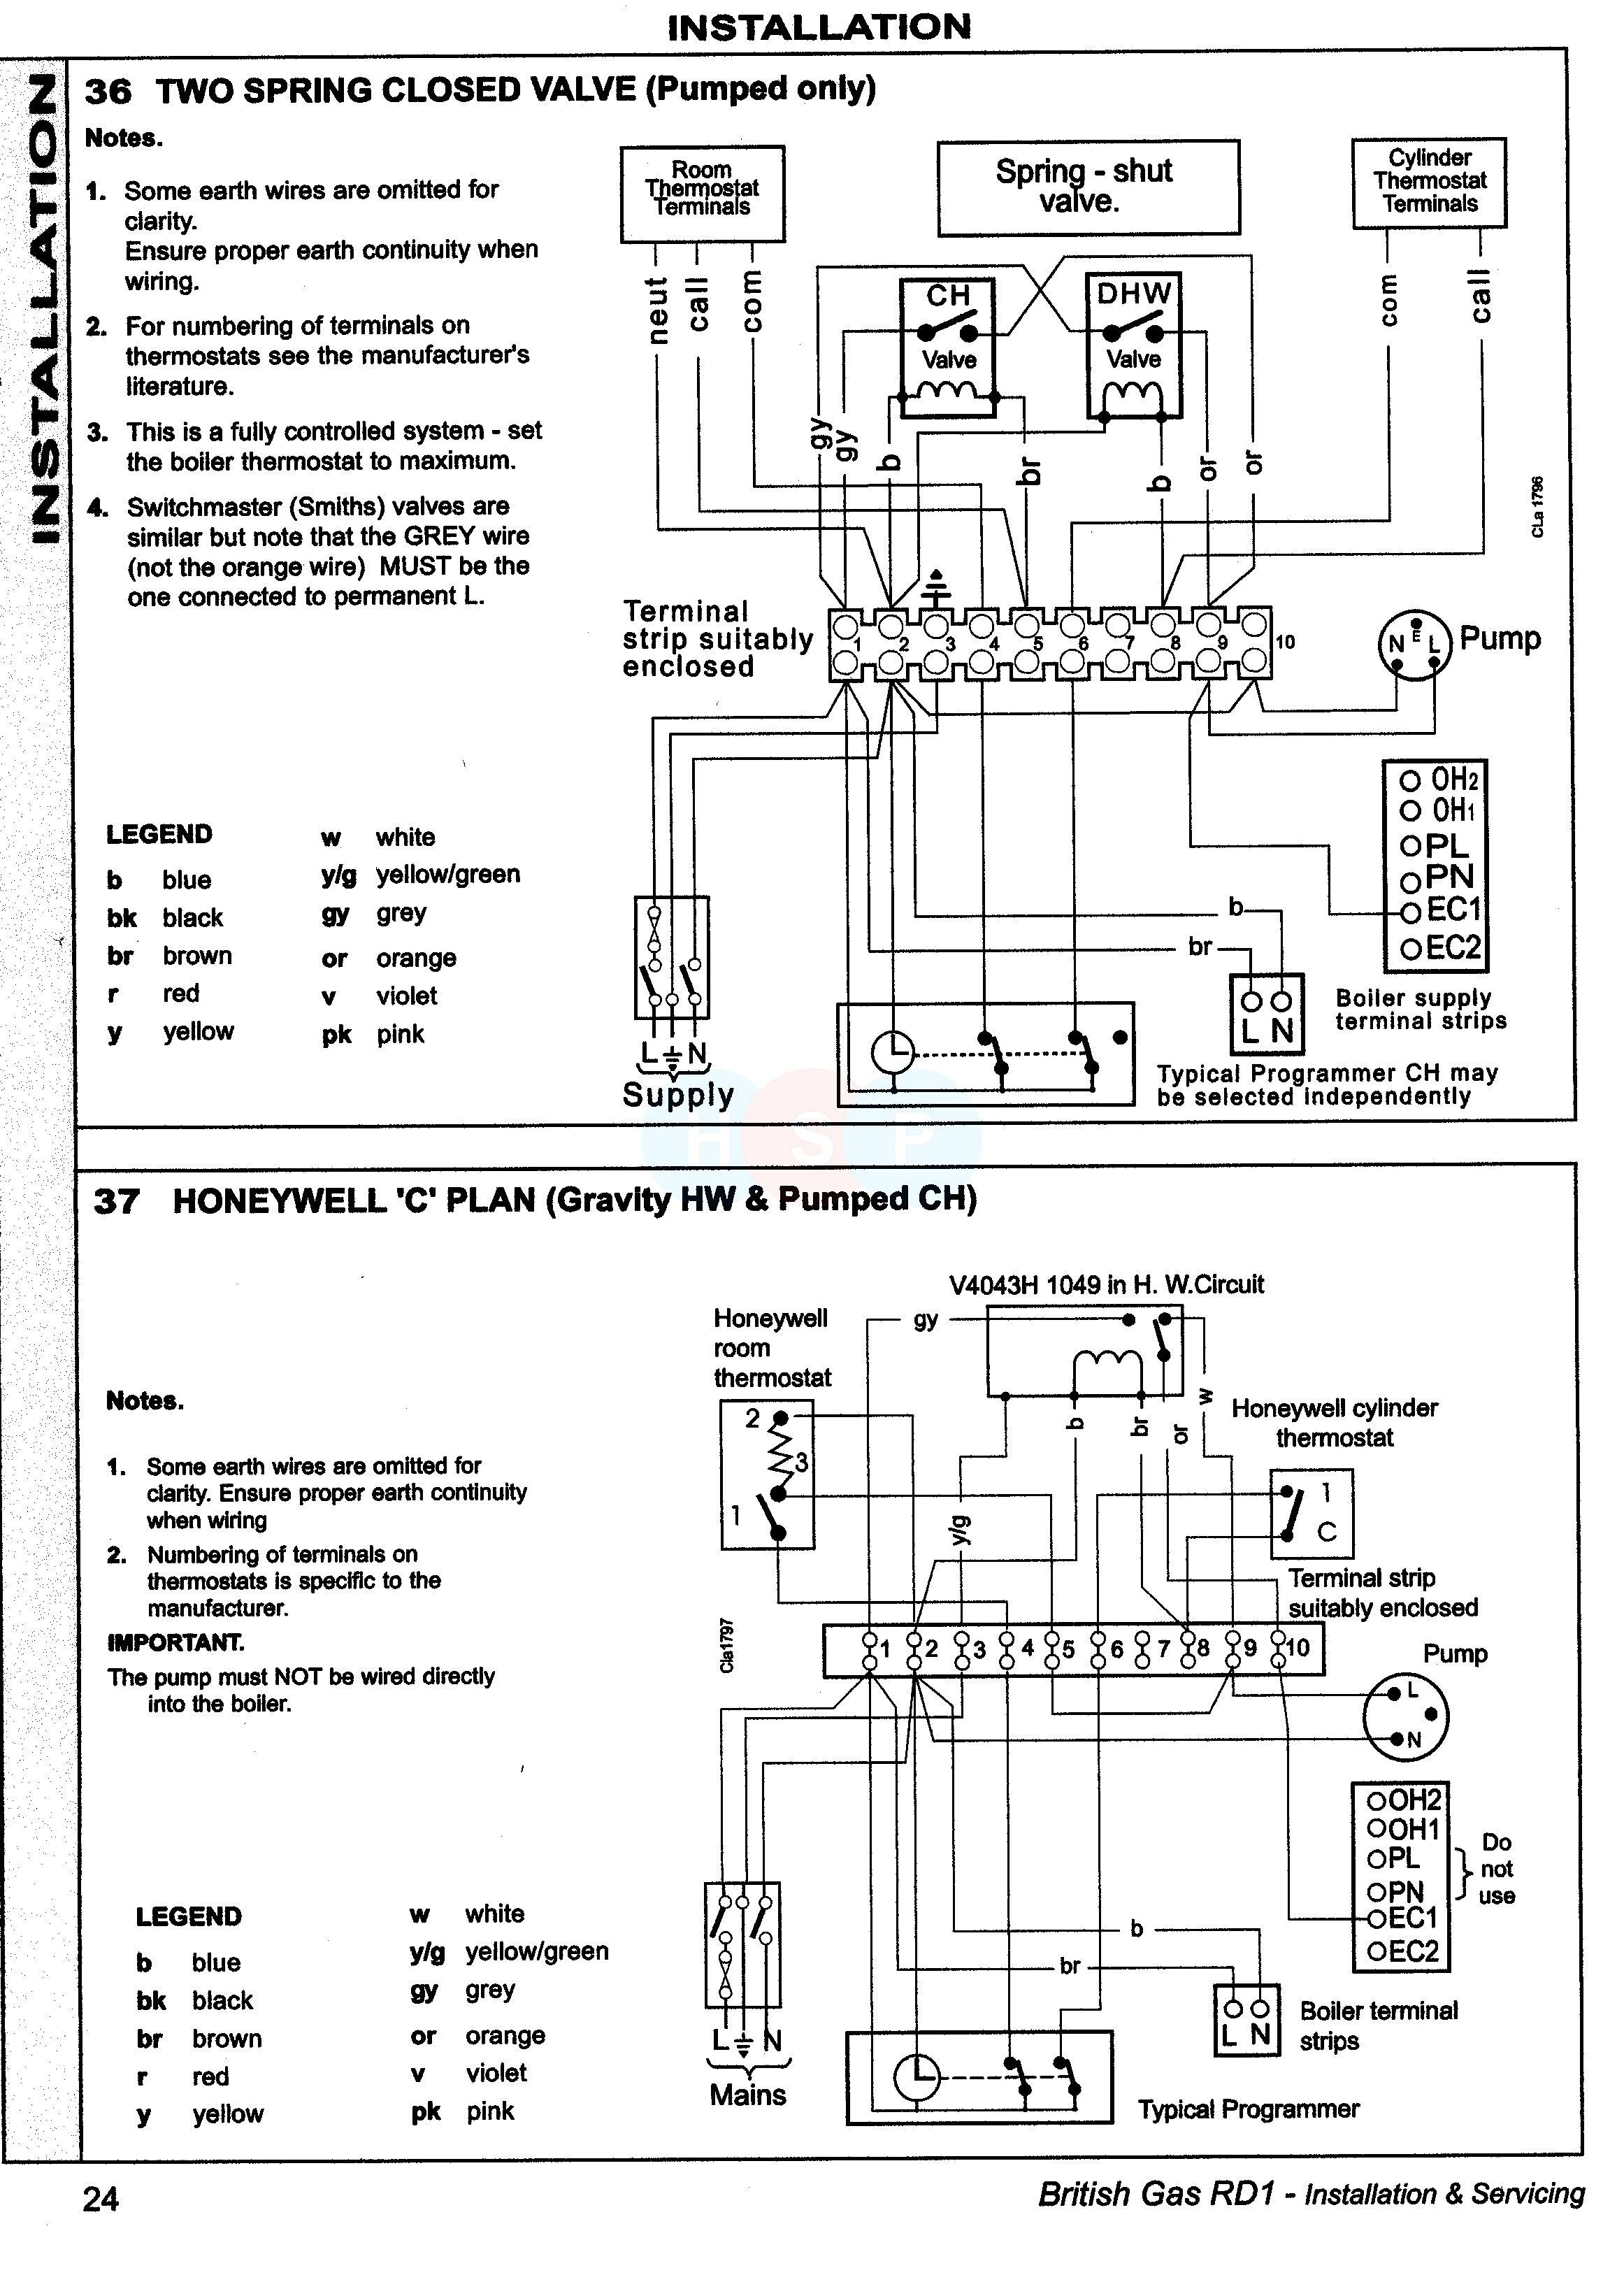 Coats 1150-2d Wiring Diagm Diagram] S Plan Wiring Diagram Full Version Hd Quality Of Coats 1150-2d Wiring Diagm